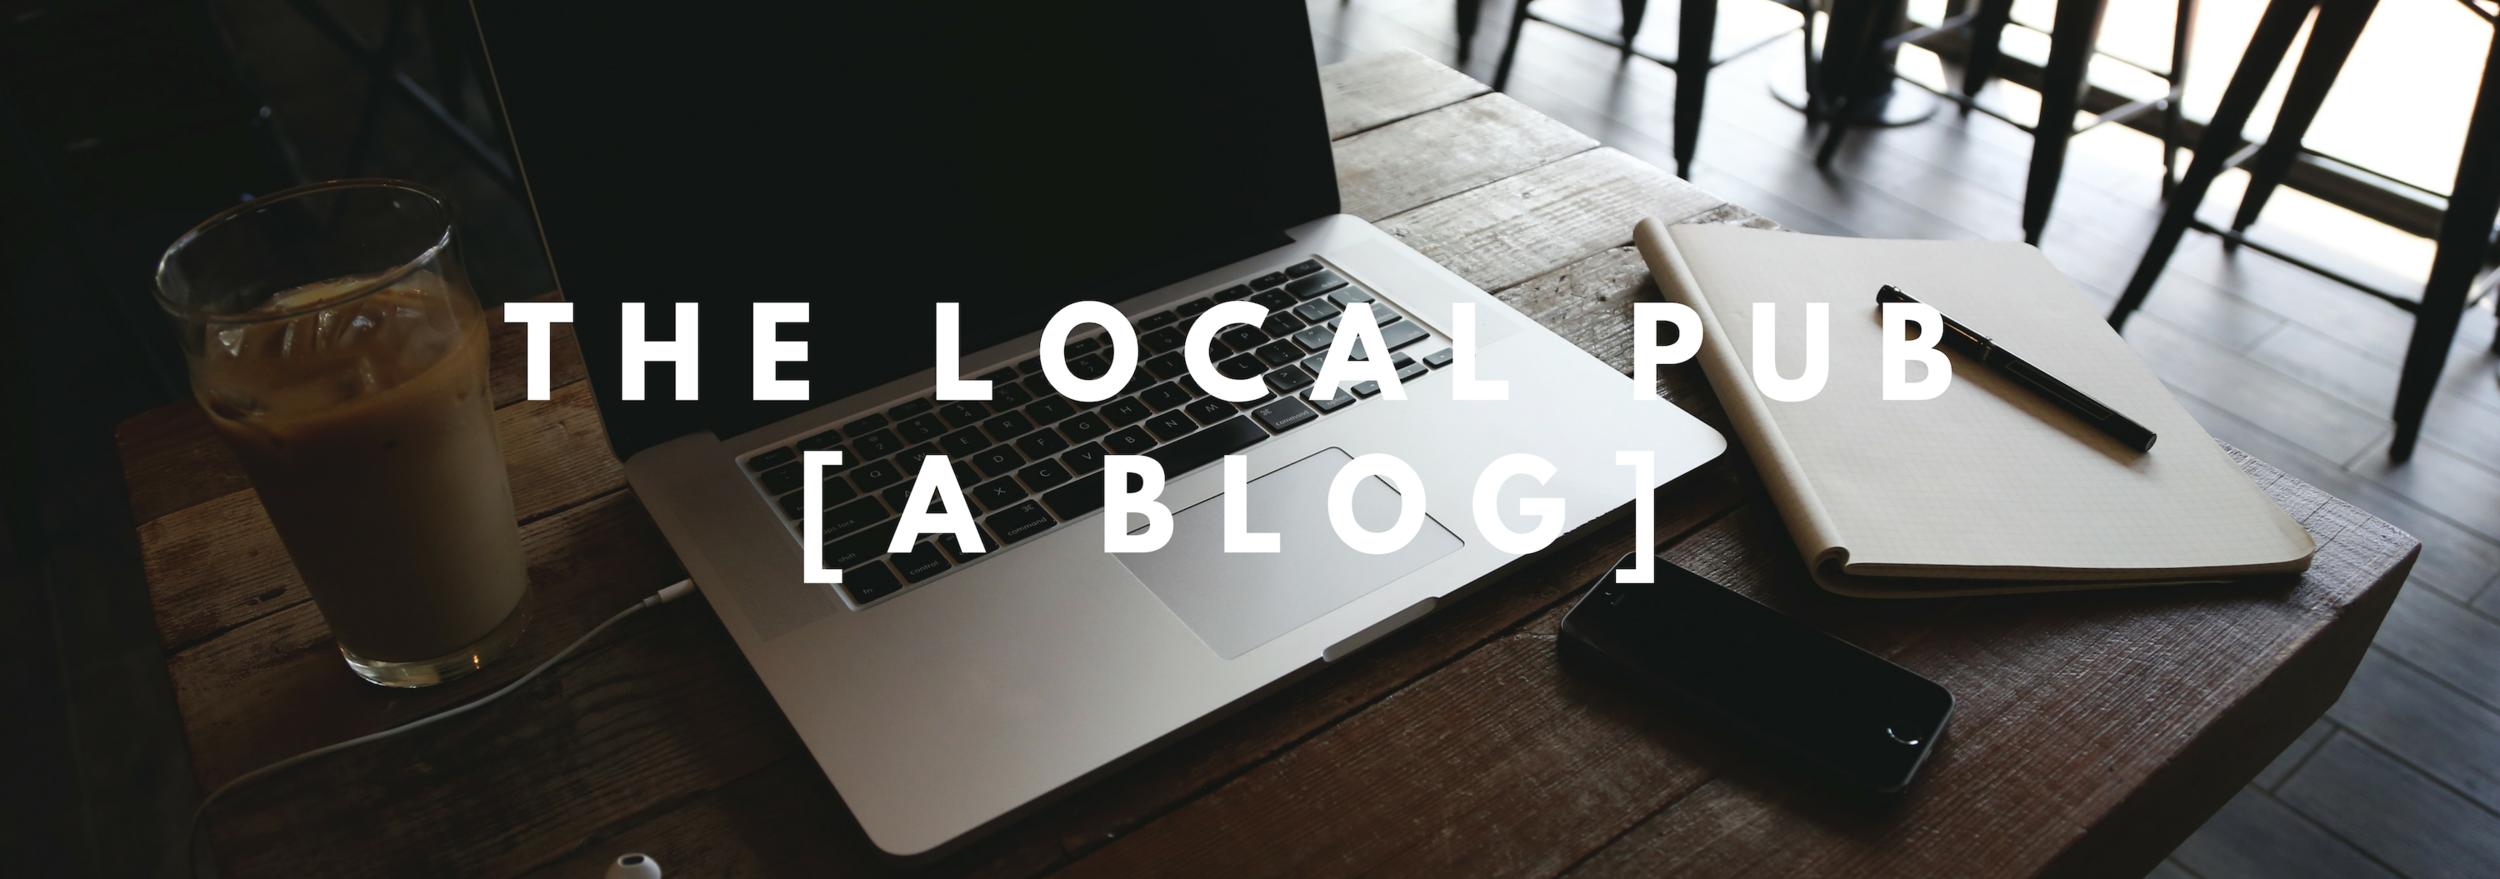 the local pub[a blog].png